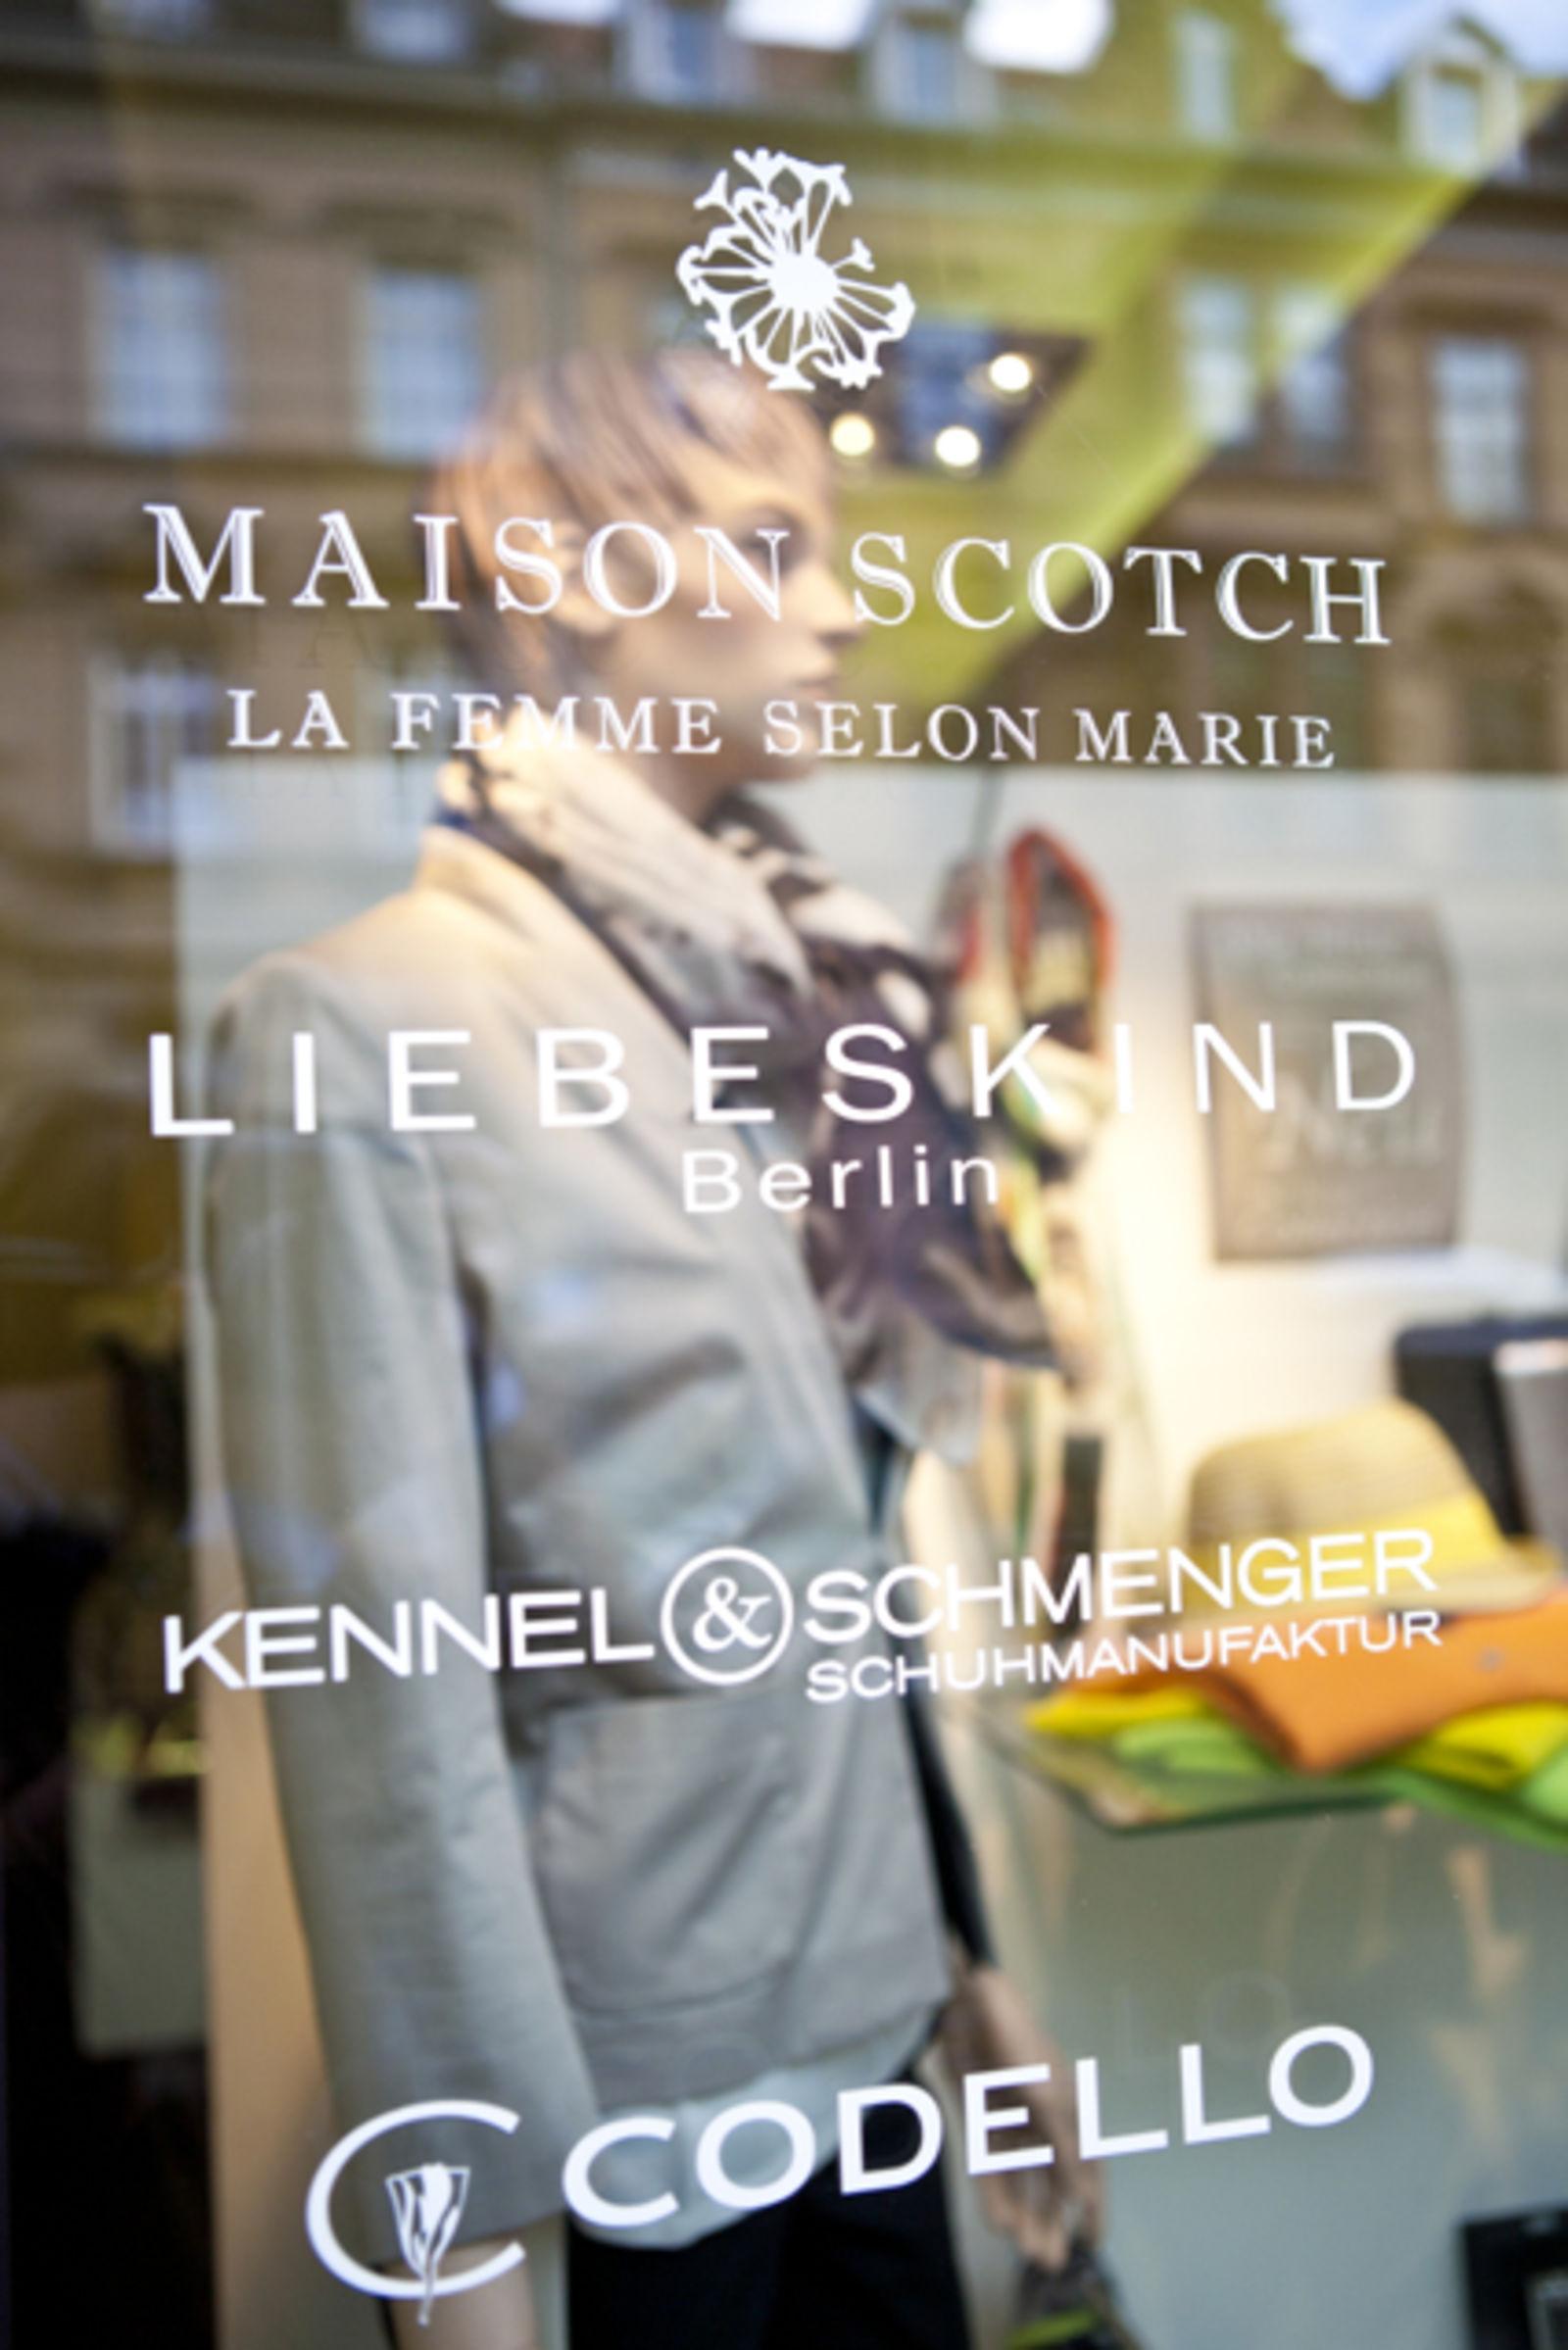 Vera Ensinger Shoes & Fashion in Heidelberg (Bild 8)